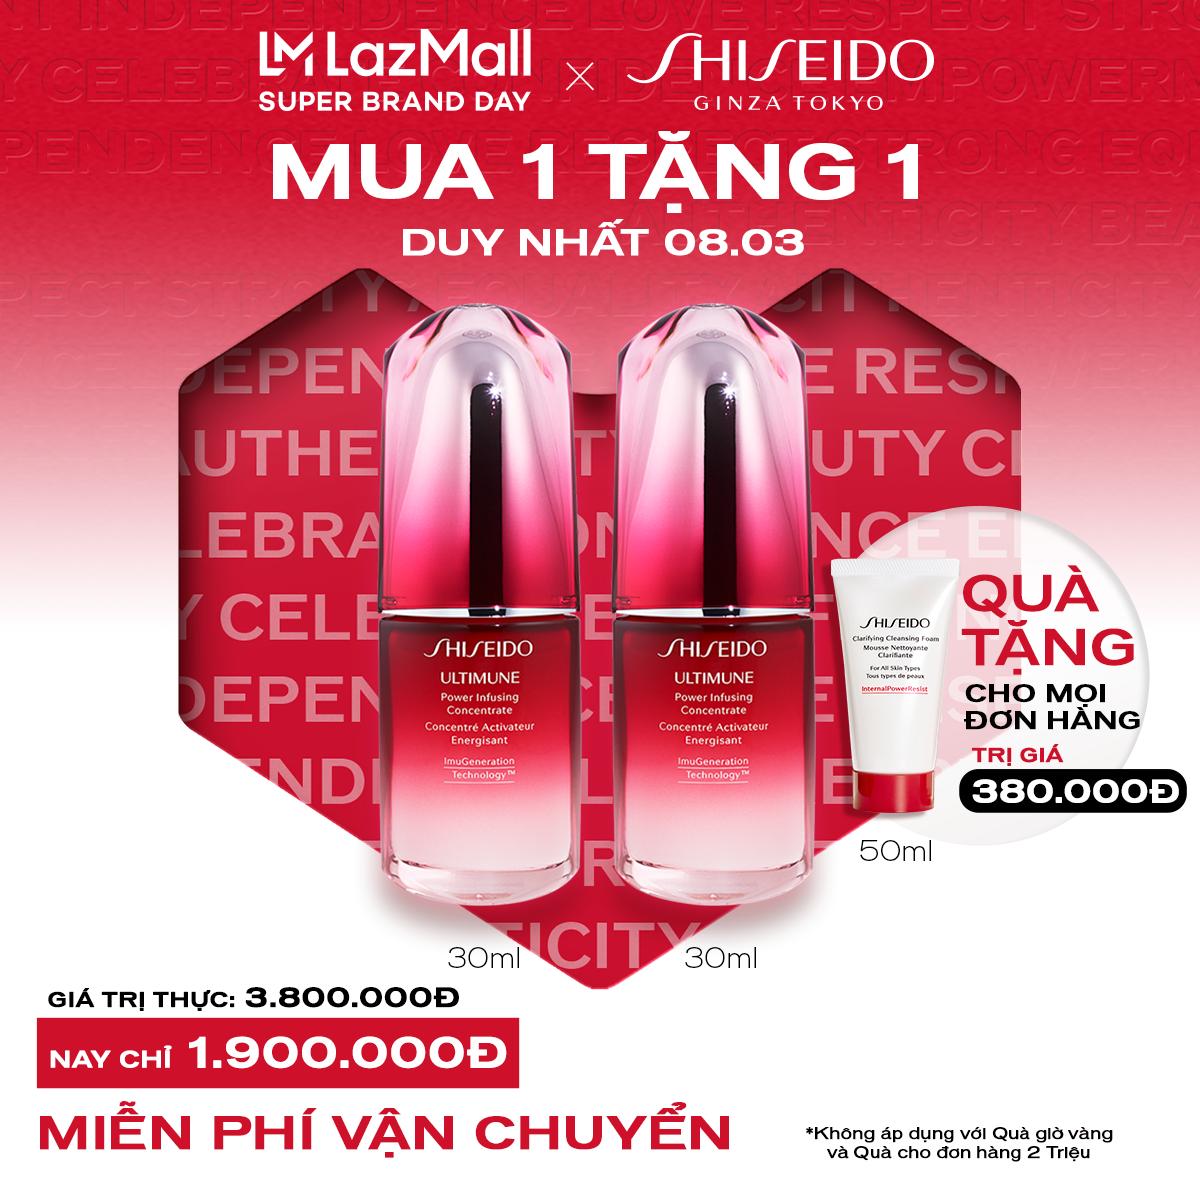 [MUA 1 TẶNG 1 – Duy nhất 8.3] Tinh chất dưỡng da Shiseido Ultimune Power Infusing Concentrate N 30ml